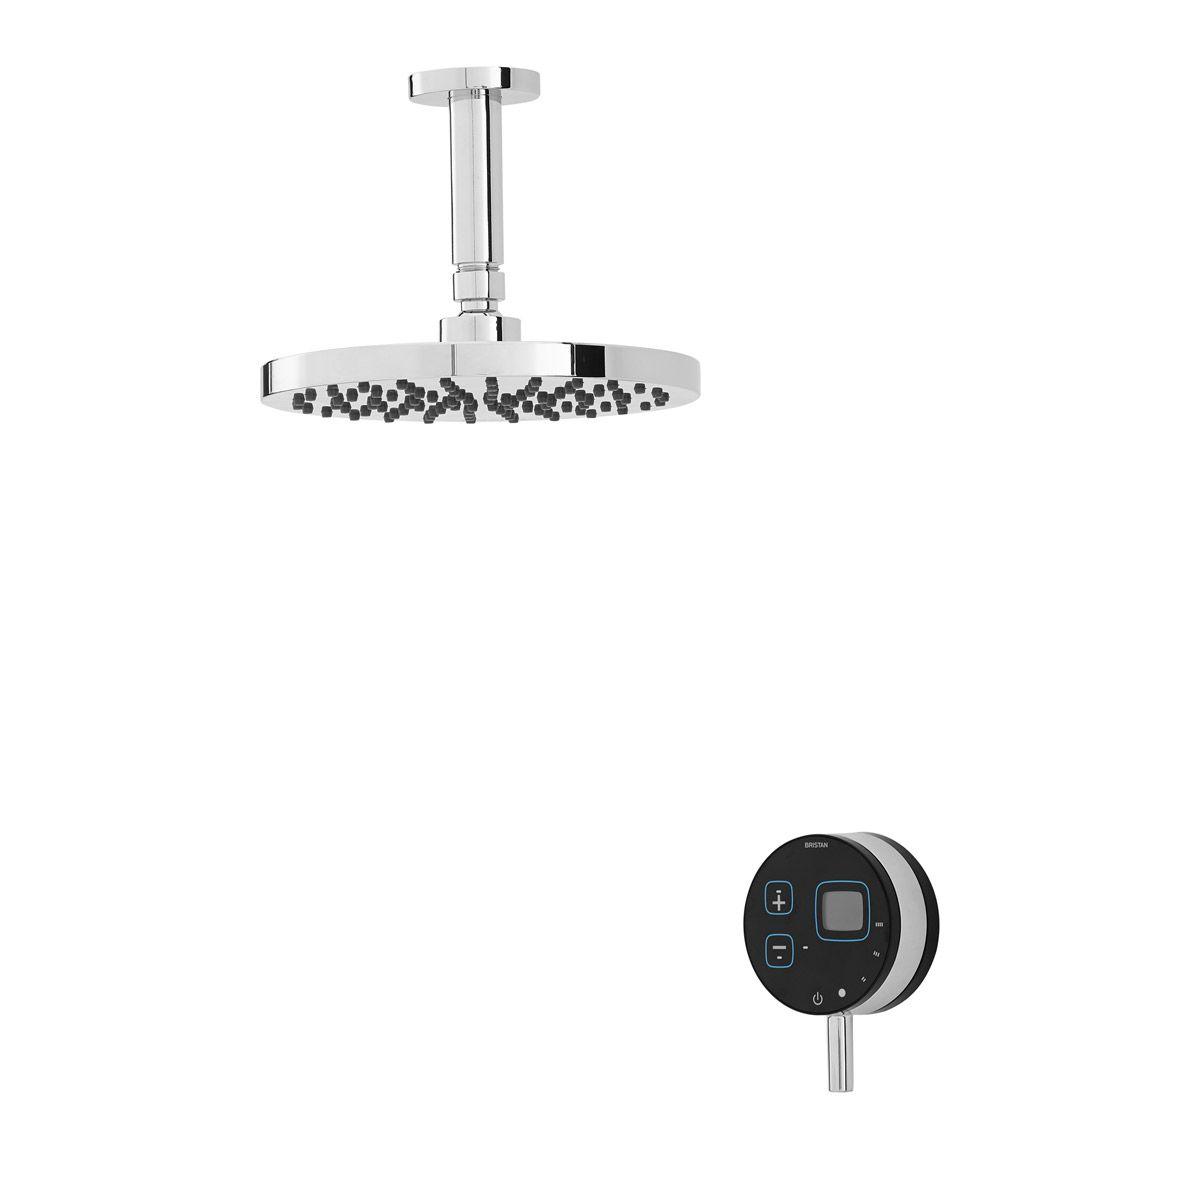 Bristan artisan evo digital shower with fixed head black